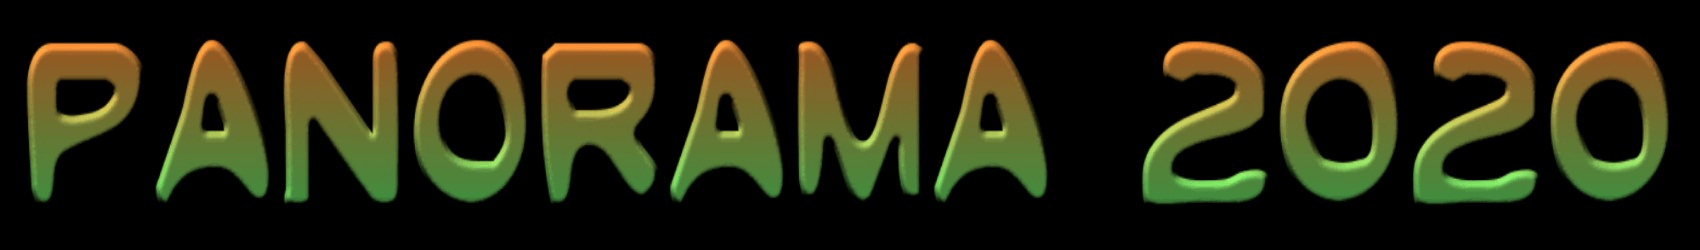 Panorama 2020 logo